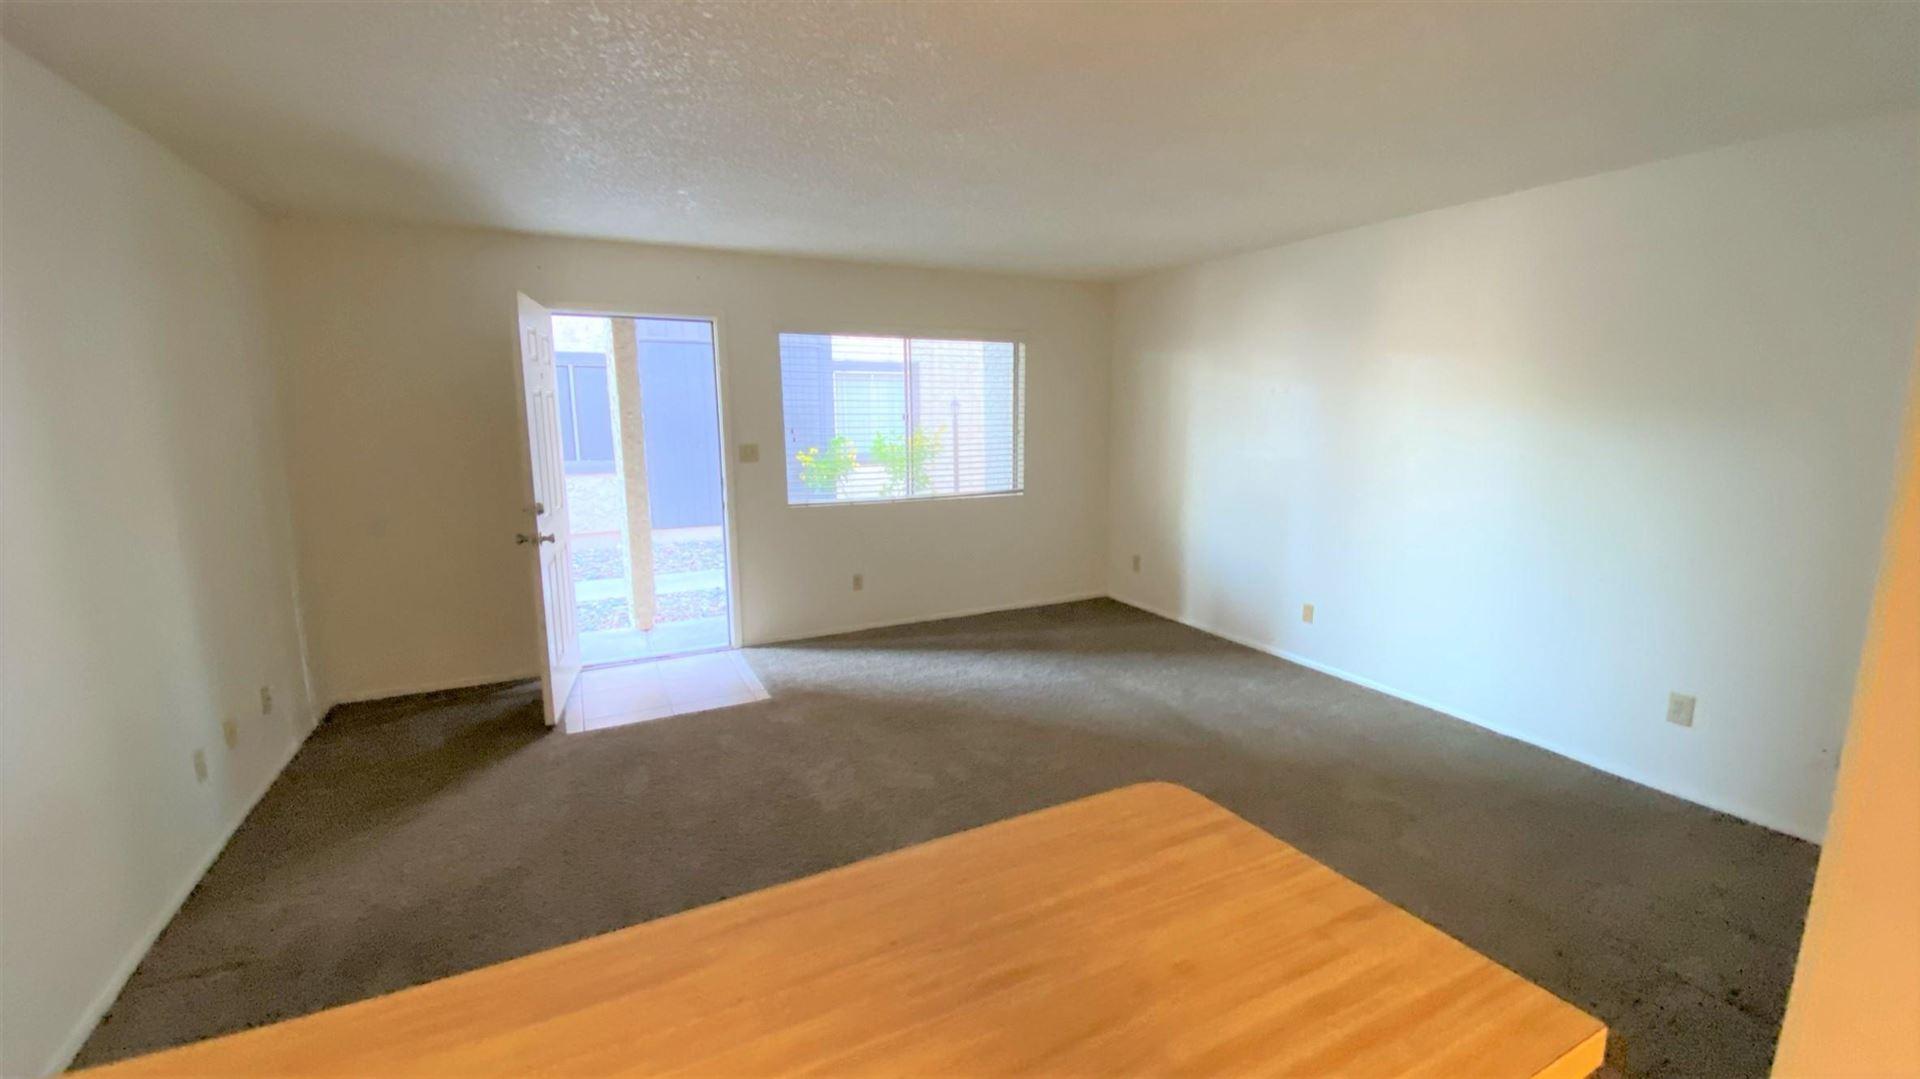 Photo of 700 W UNIVERSITY Drive #108, Tempe, AZ 85281 (MLS # 6231849)